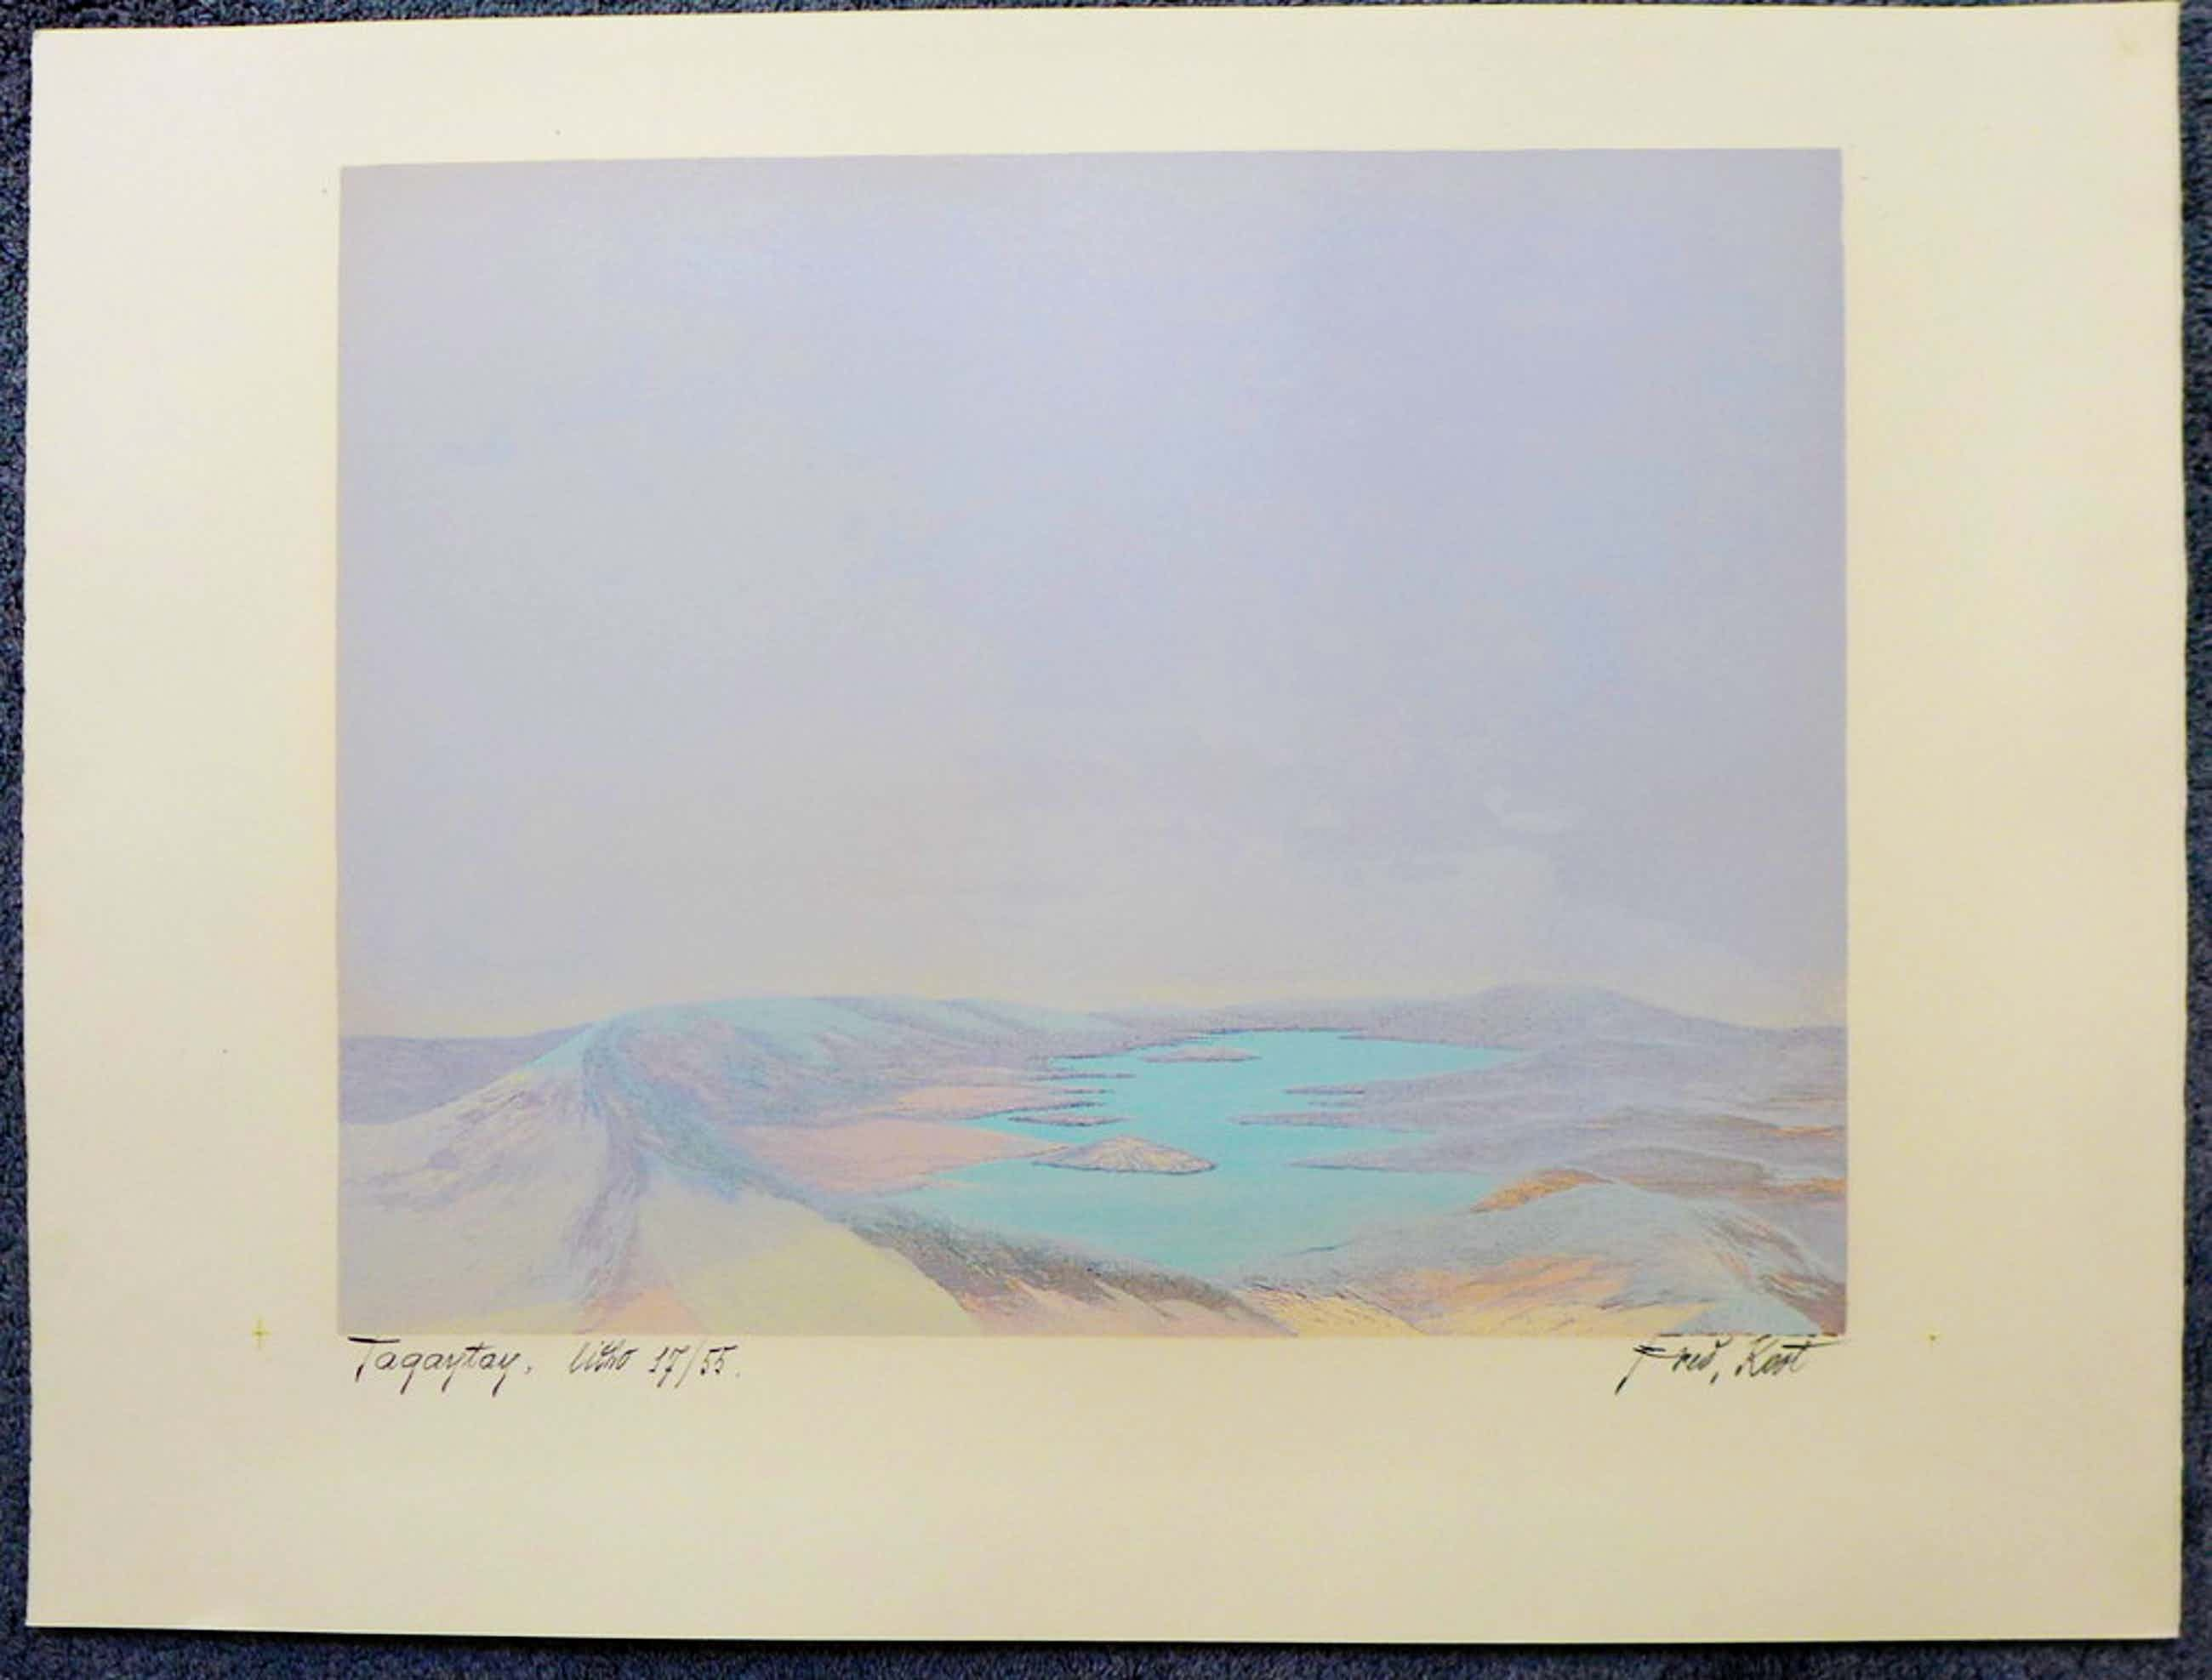 Fred Koot, litho, titel Tagaytay, oplage 19/46, beeldformaat 35,3 x 44,8 cm.  kopen? Bied vanaf 50!